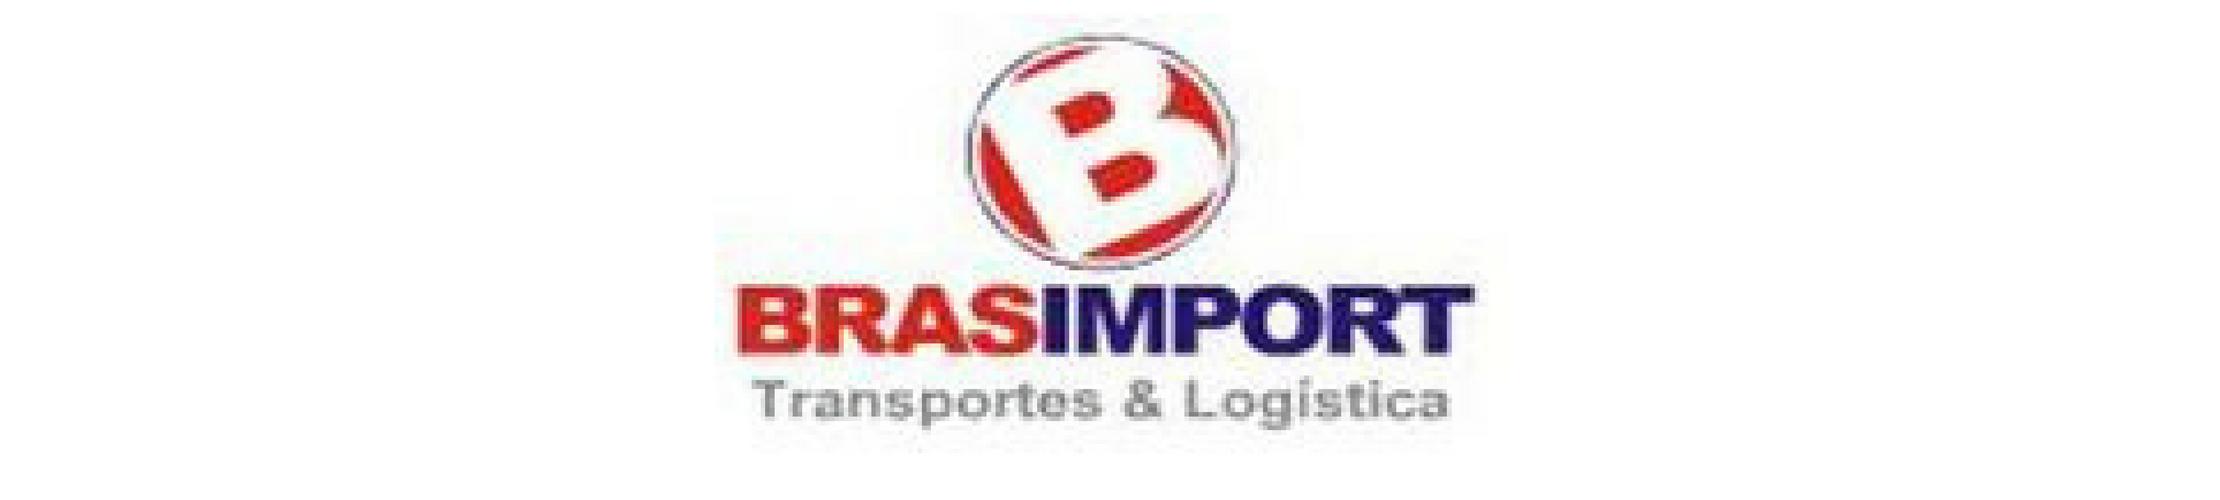 BRASIMPORT-TRANSPORTE-INDUSTRIA-E-COMERCIO-LTDA-logo.png